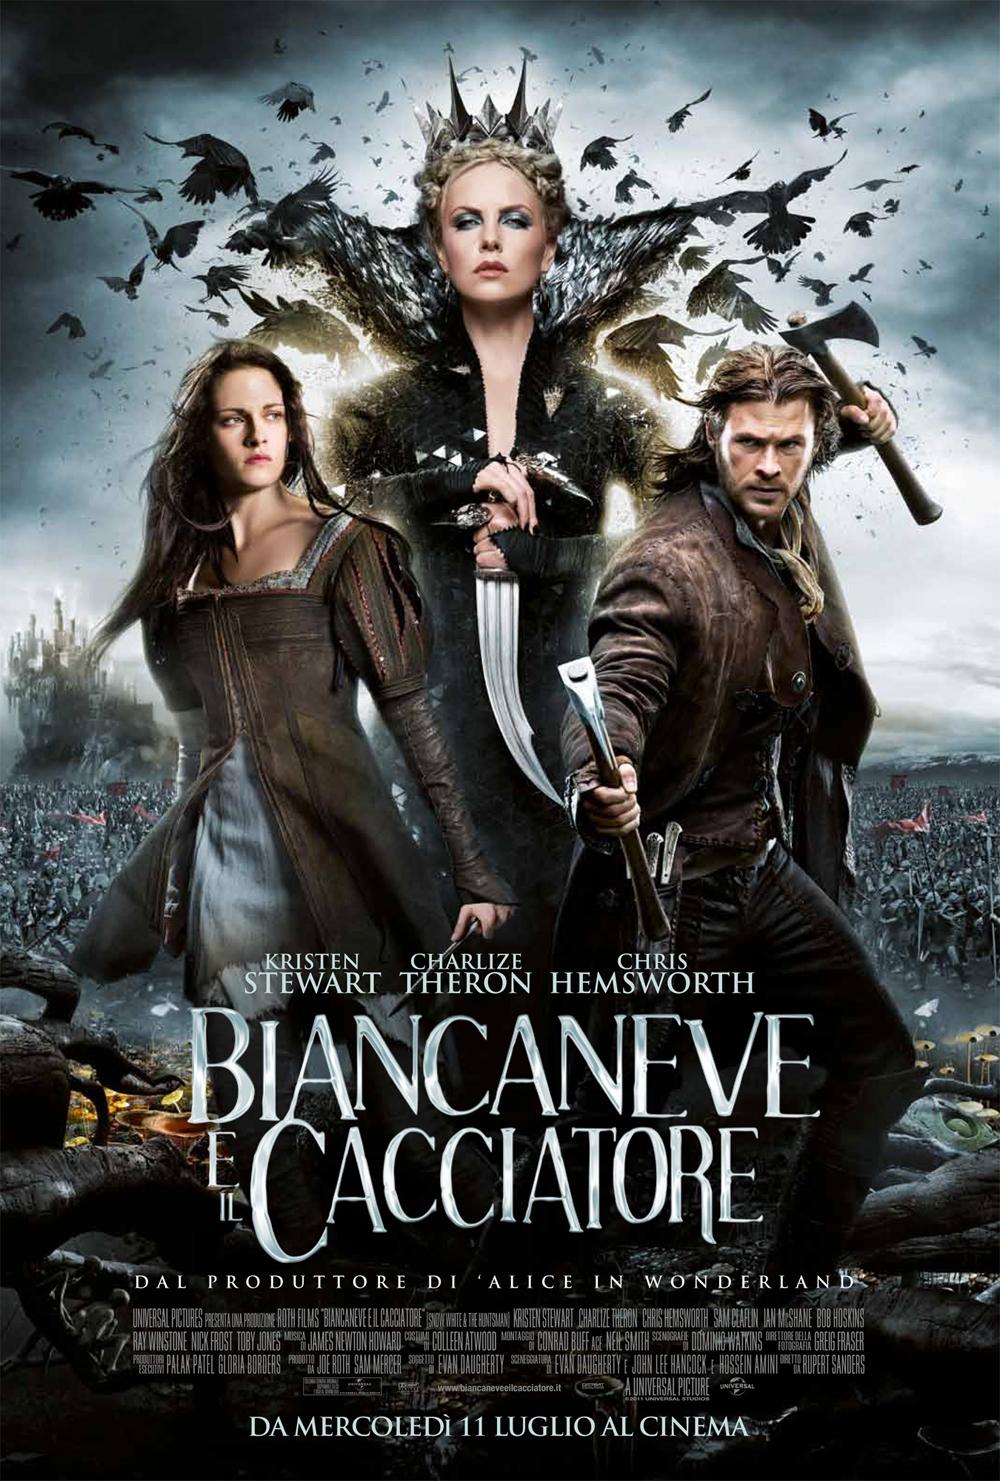 Biancaneve E Il Cacciatore Recensione Film Film 4 Life Curiosi Di Cinema